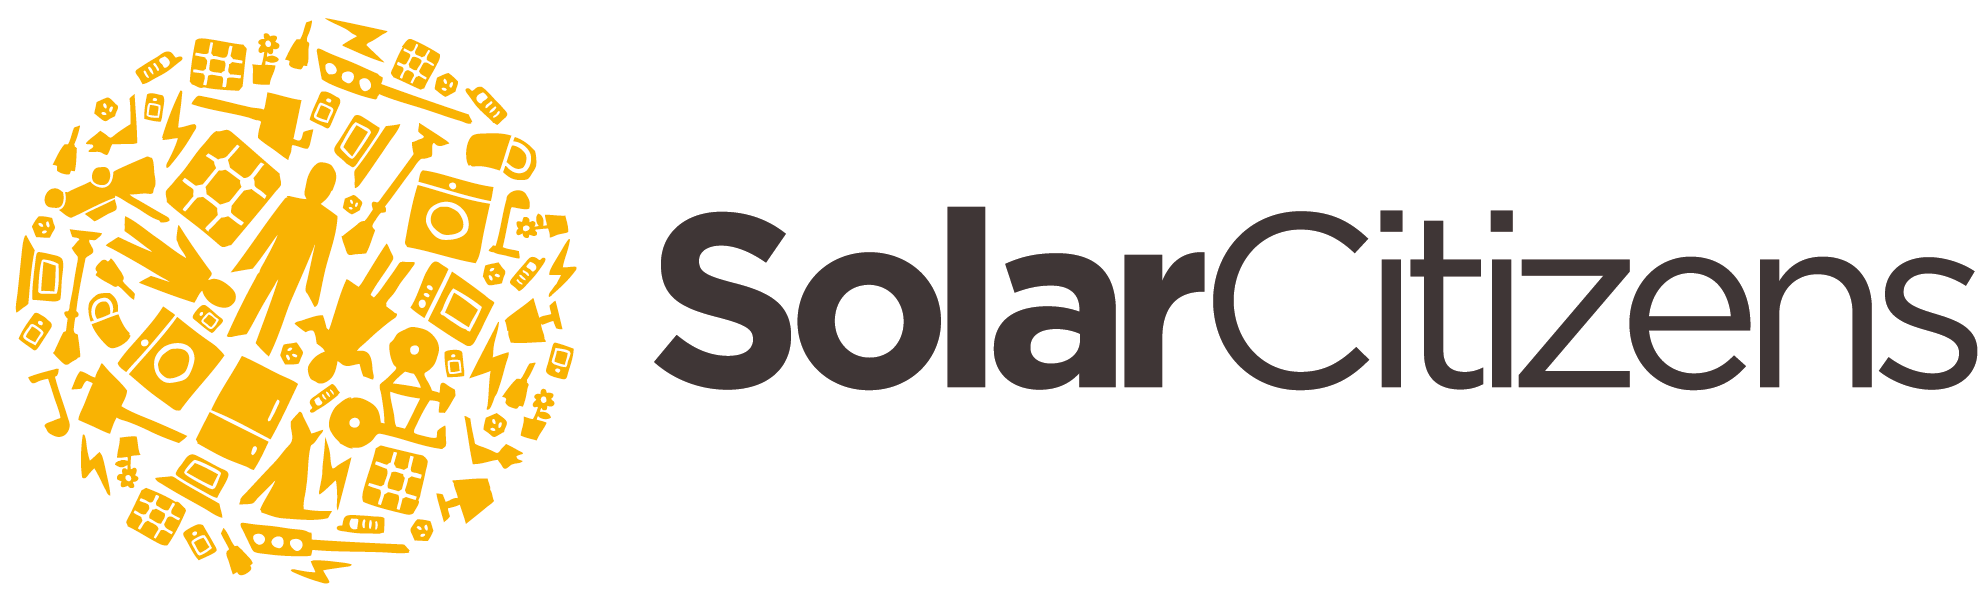 SolarCitizens_OneLine_TransparentBackground.png